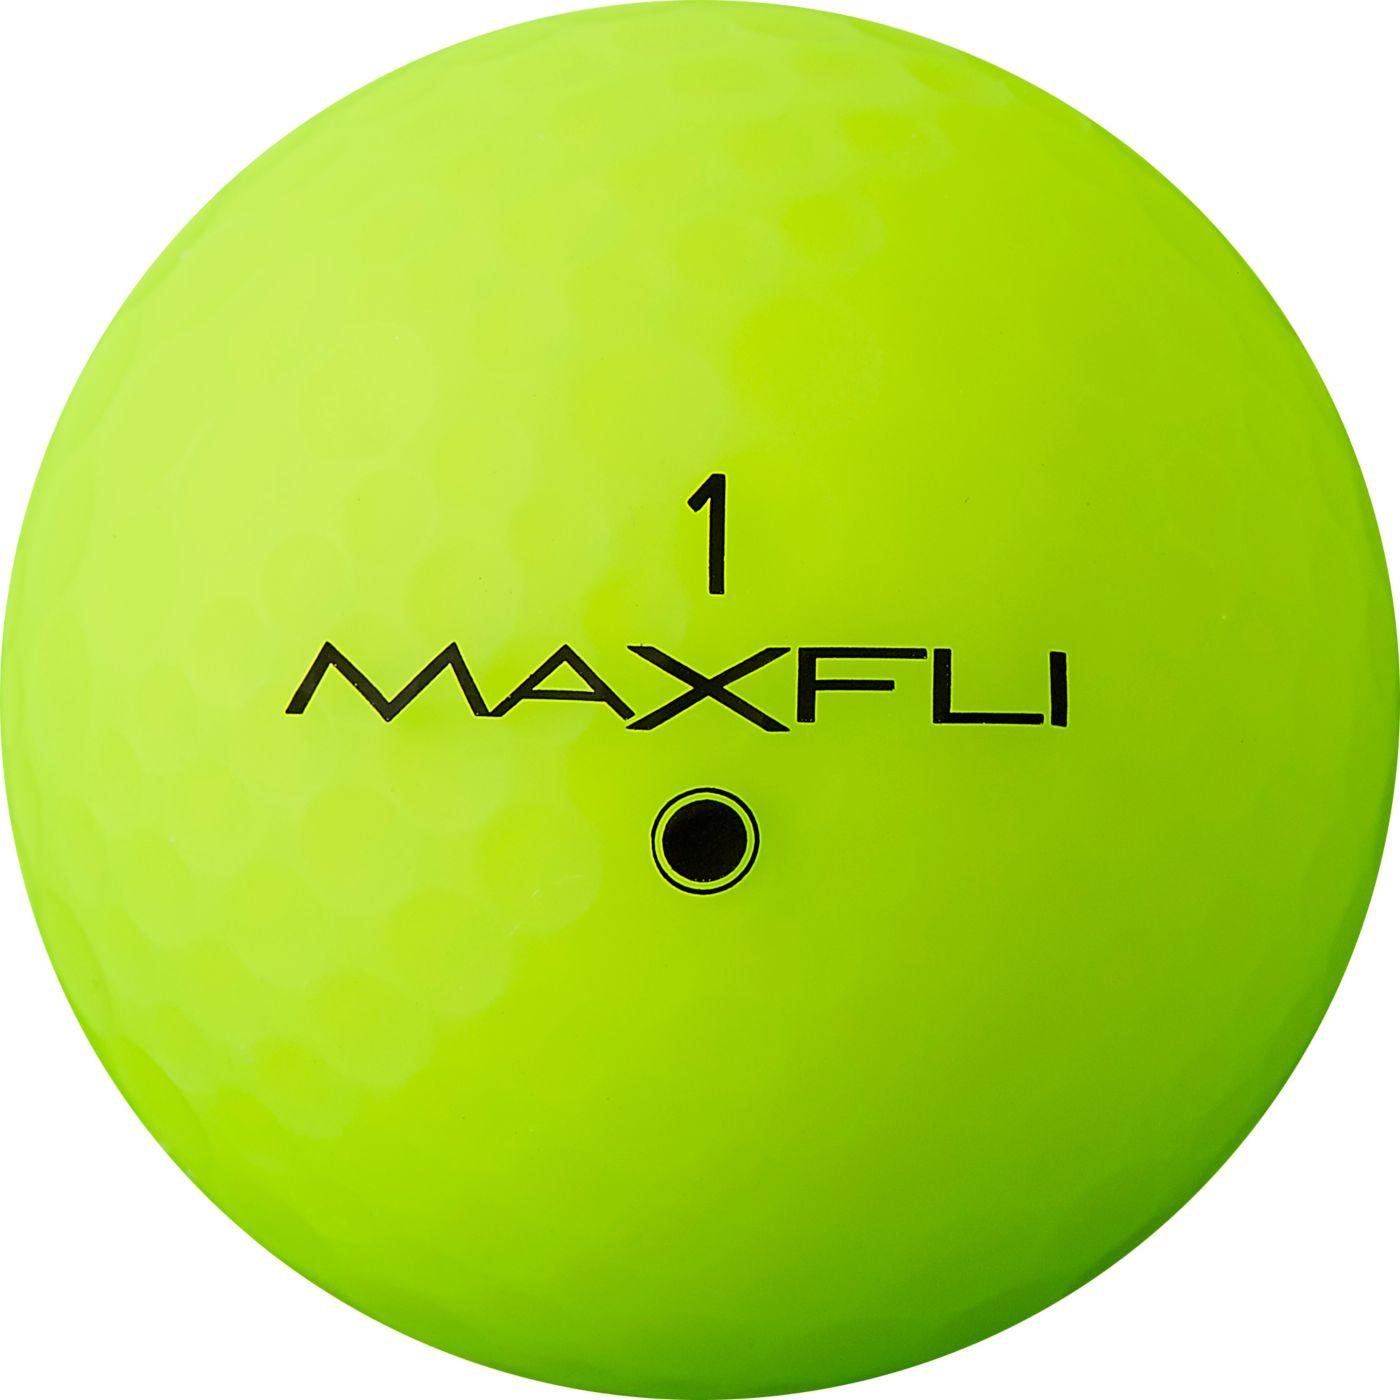 Maxfli StraightFli Matte Green Golf Balls